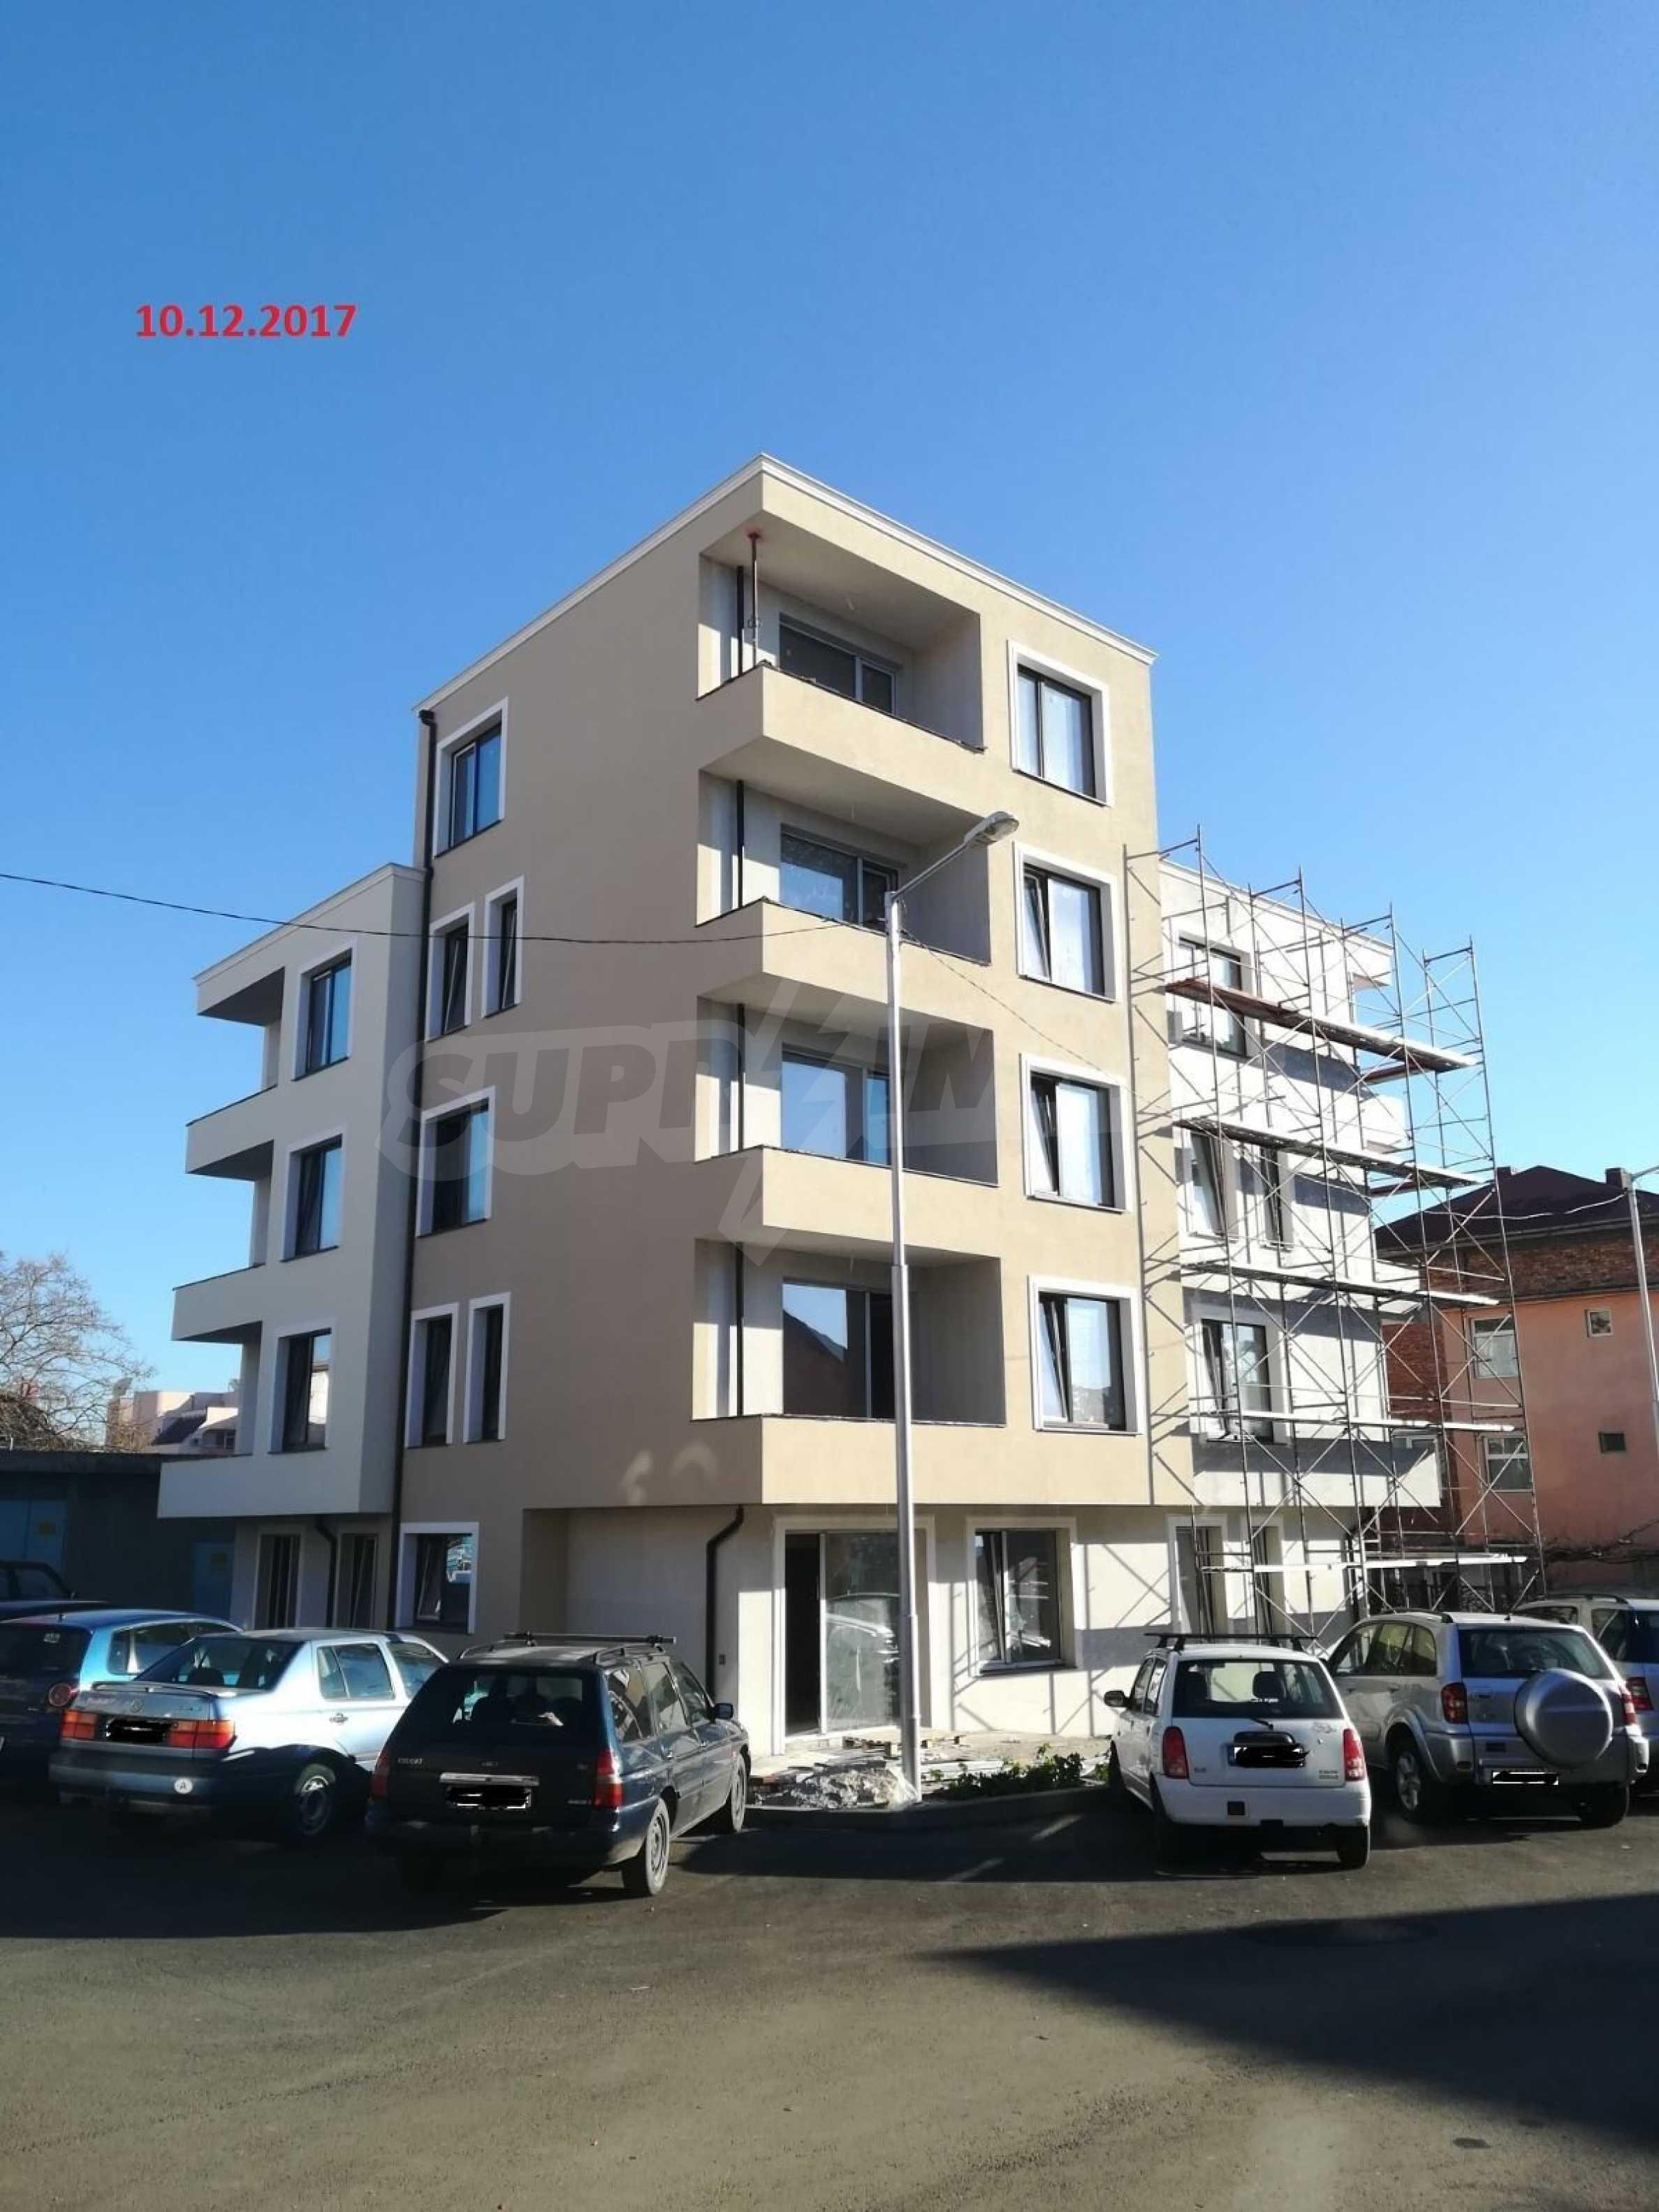 Apartments im Neubau-Gebäude in Rawda 6